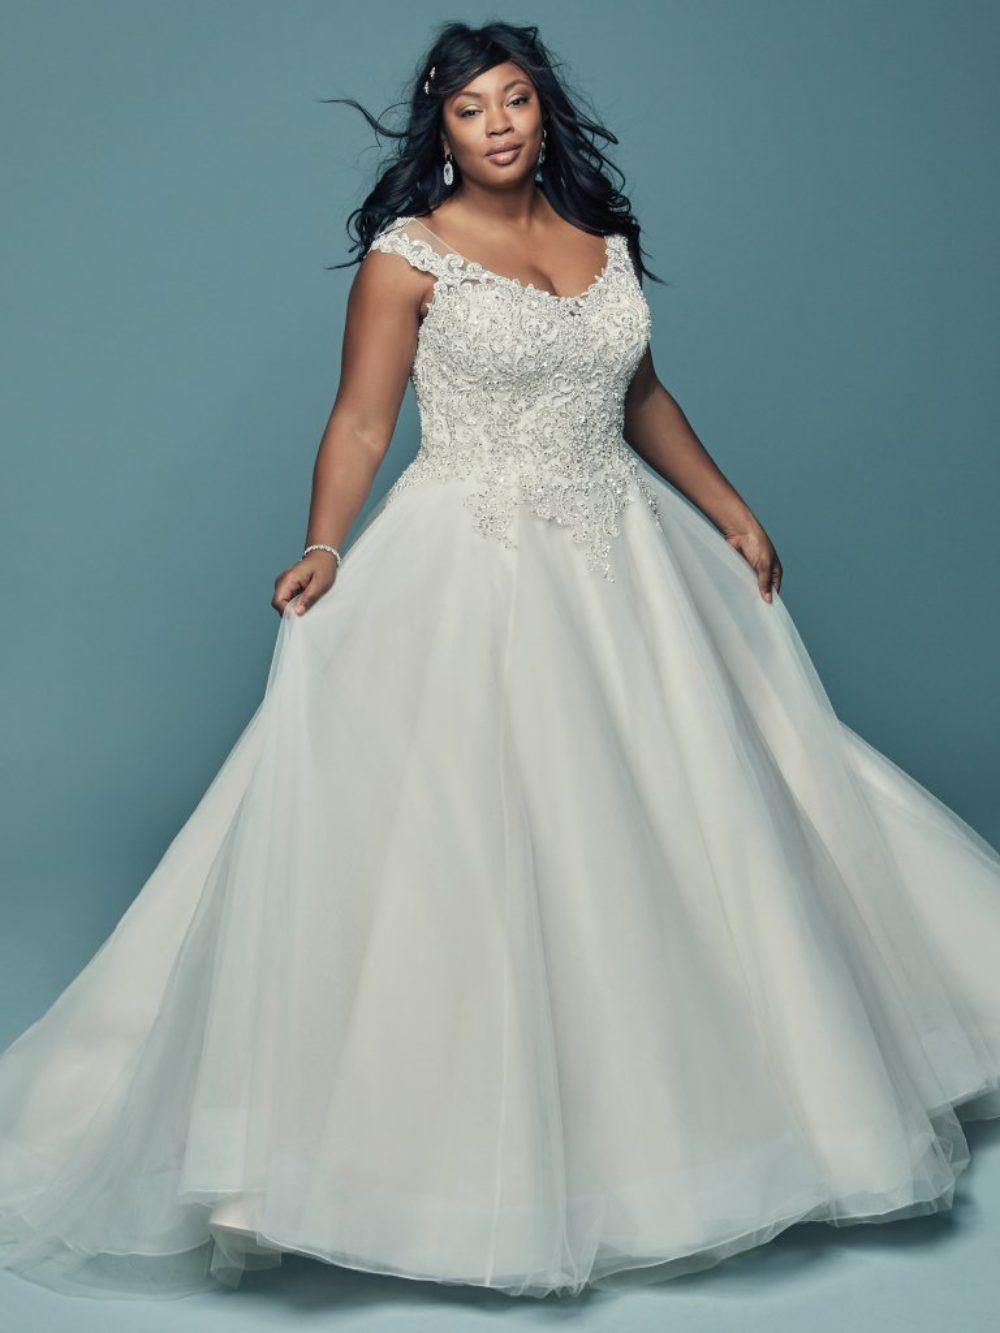 Maggie Sottero Wedding Dresses from Precious Memories Bridal Shop